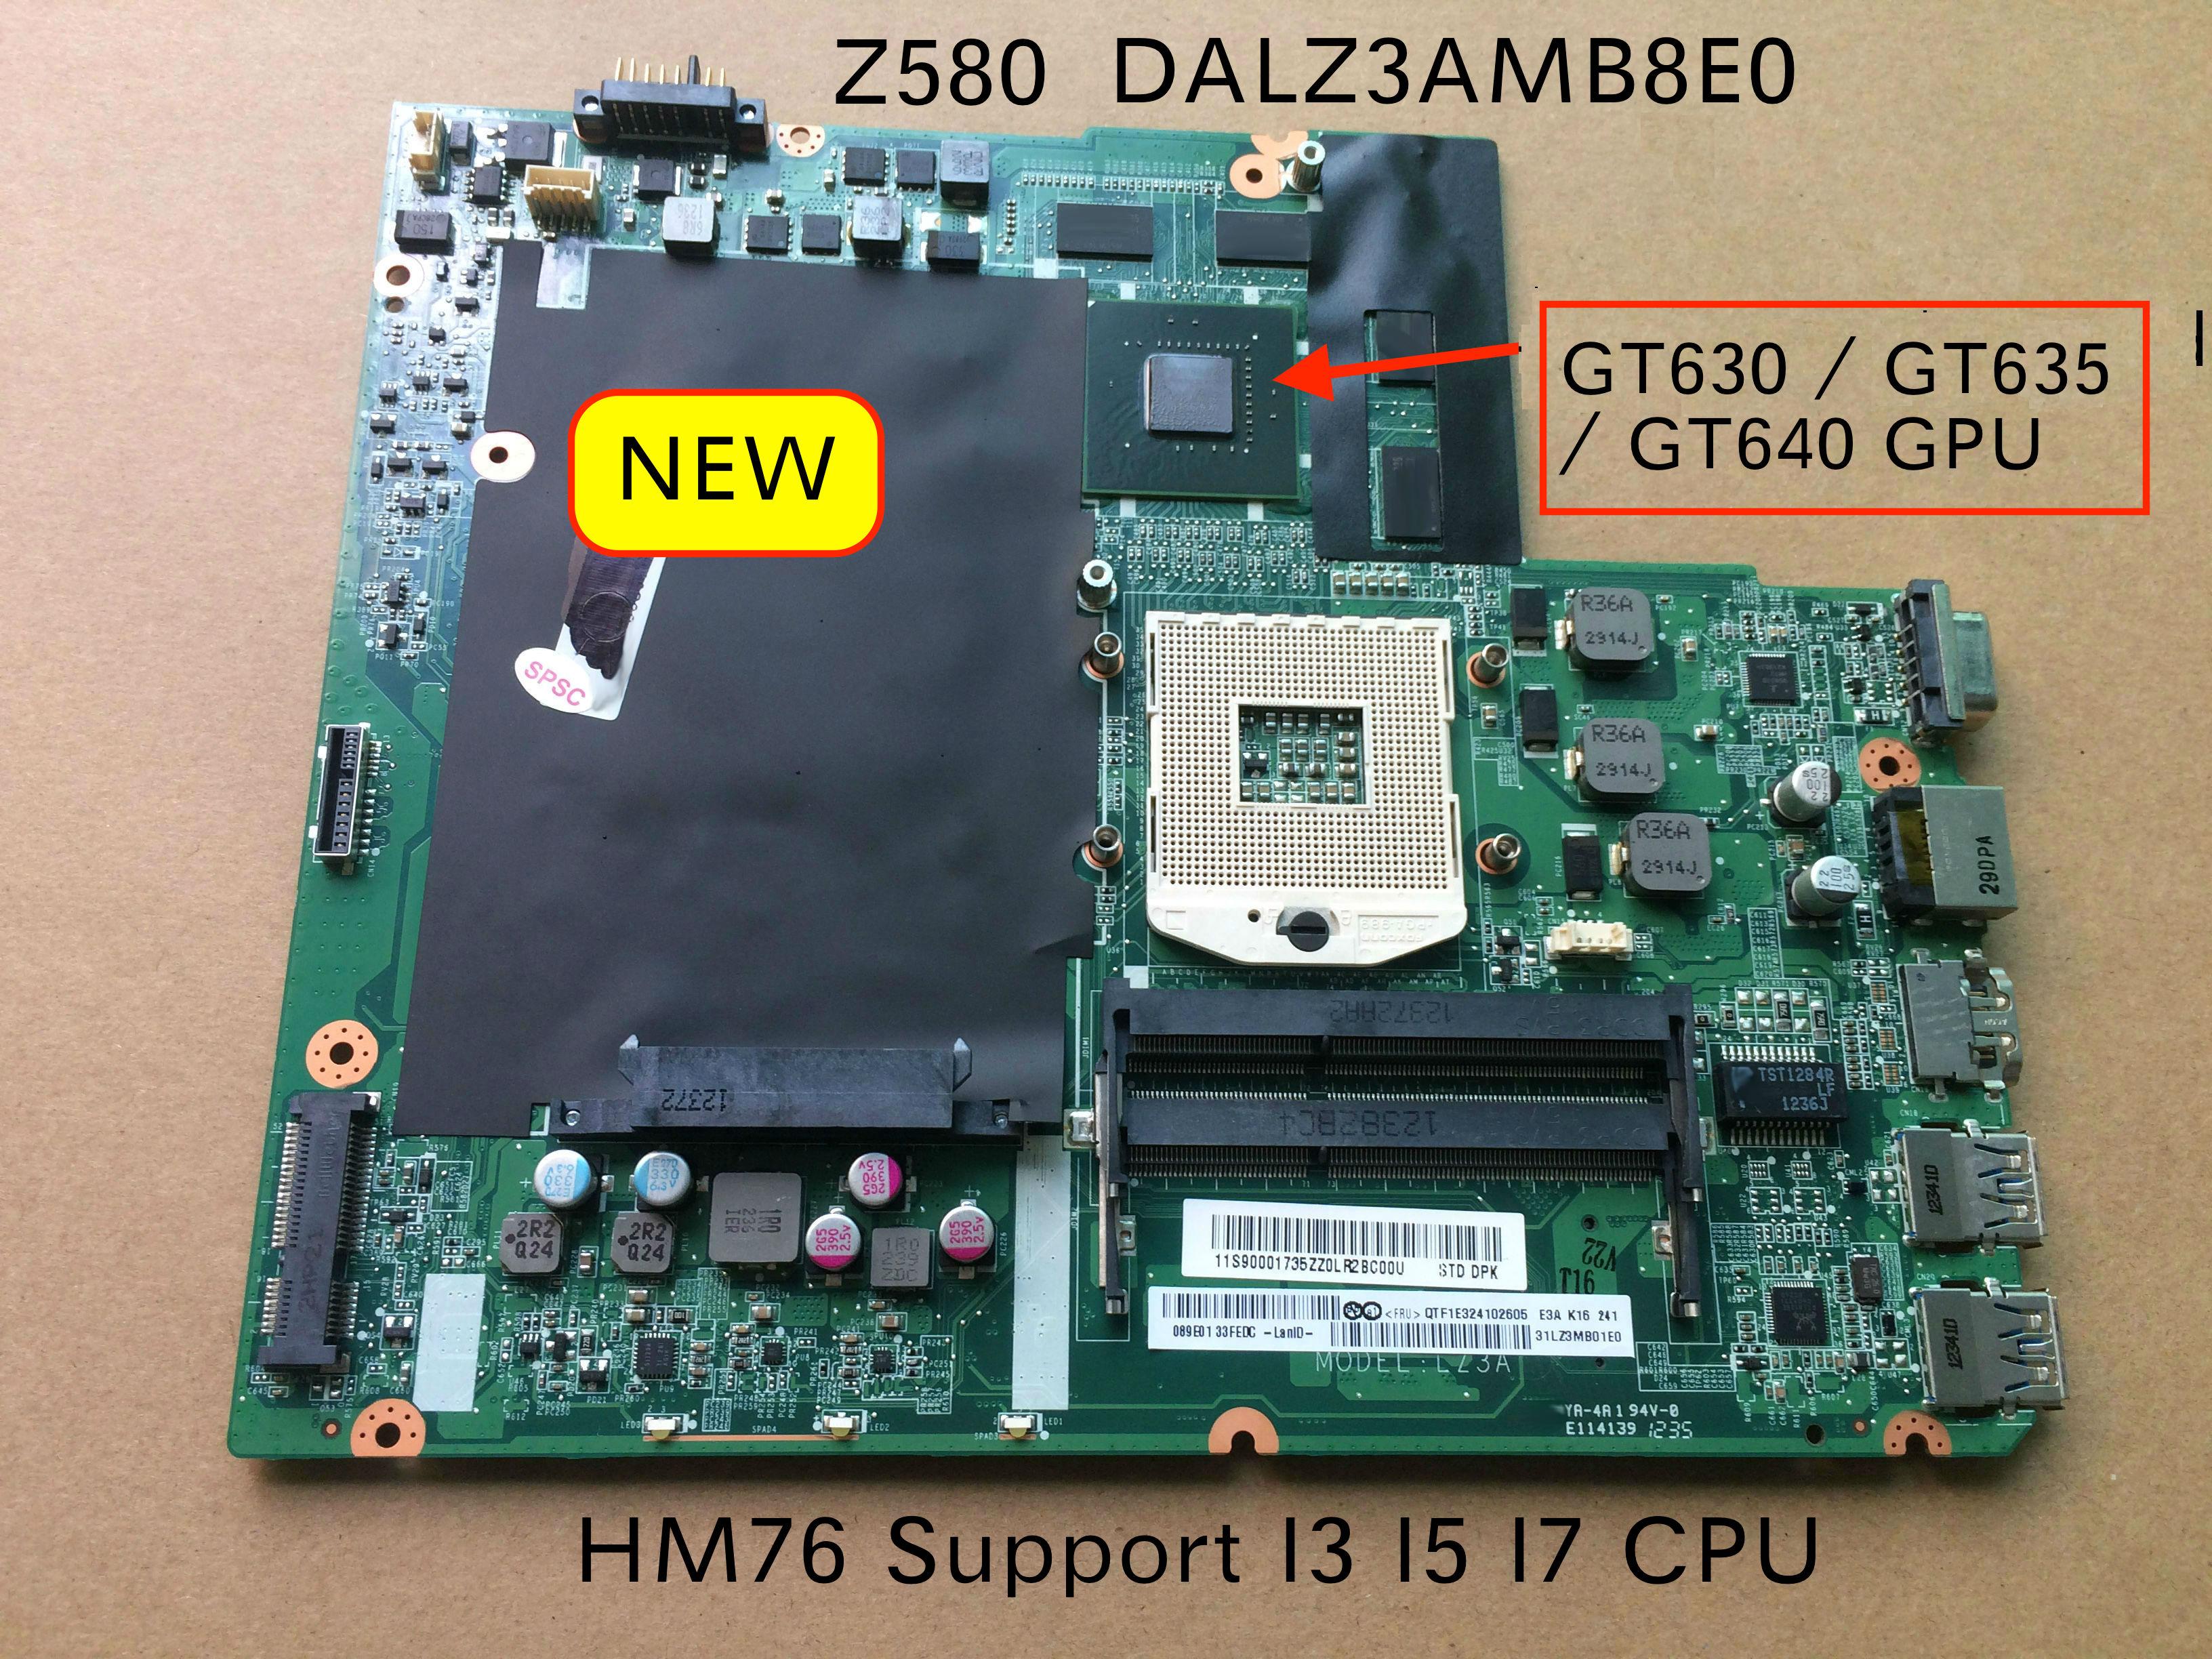 Original NOVO Laptop Motherboard Para Lenovo Ideapad Z580 DALZ3AMB8E0 GT630M GT635M placa de vídeo